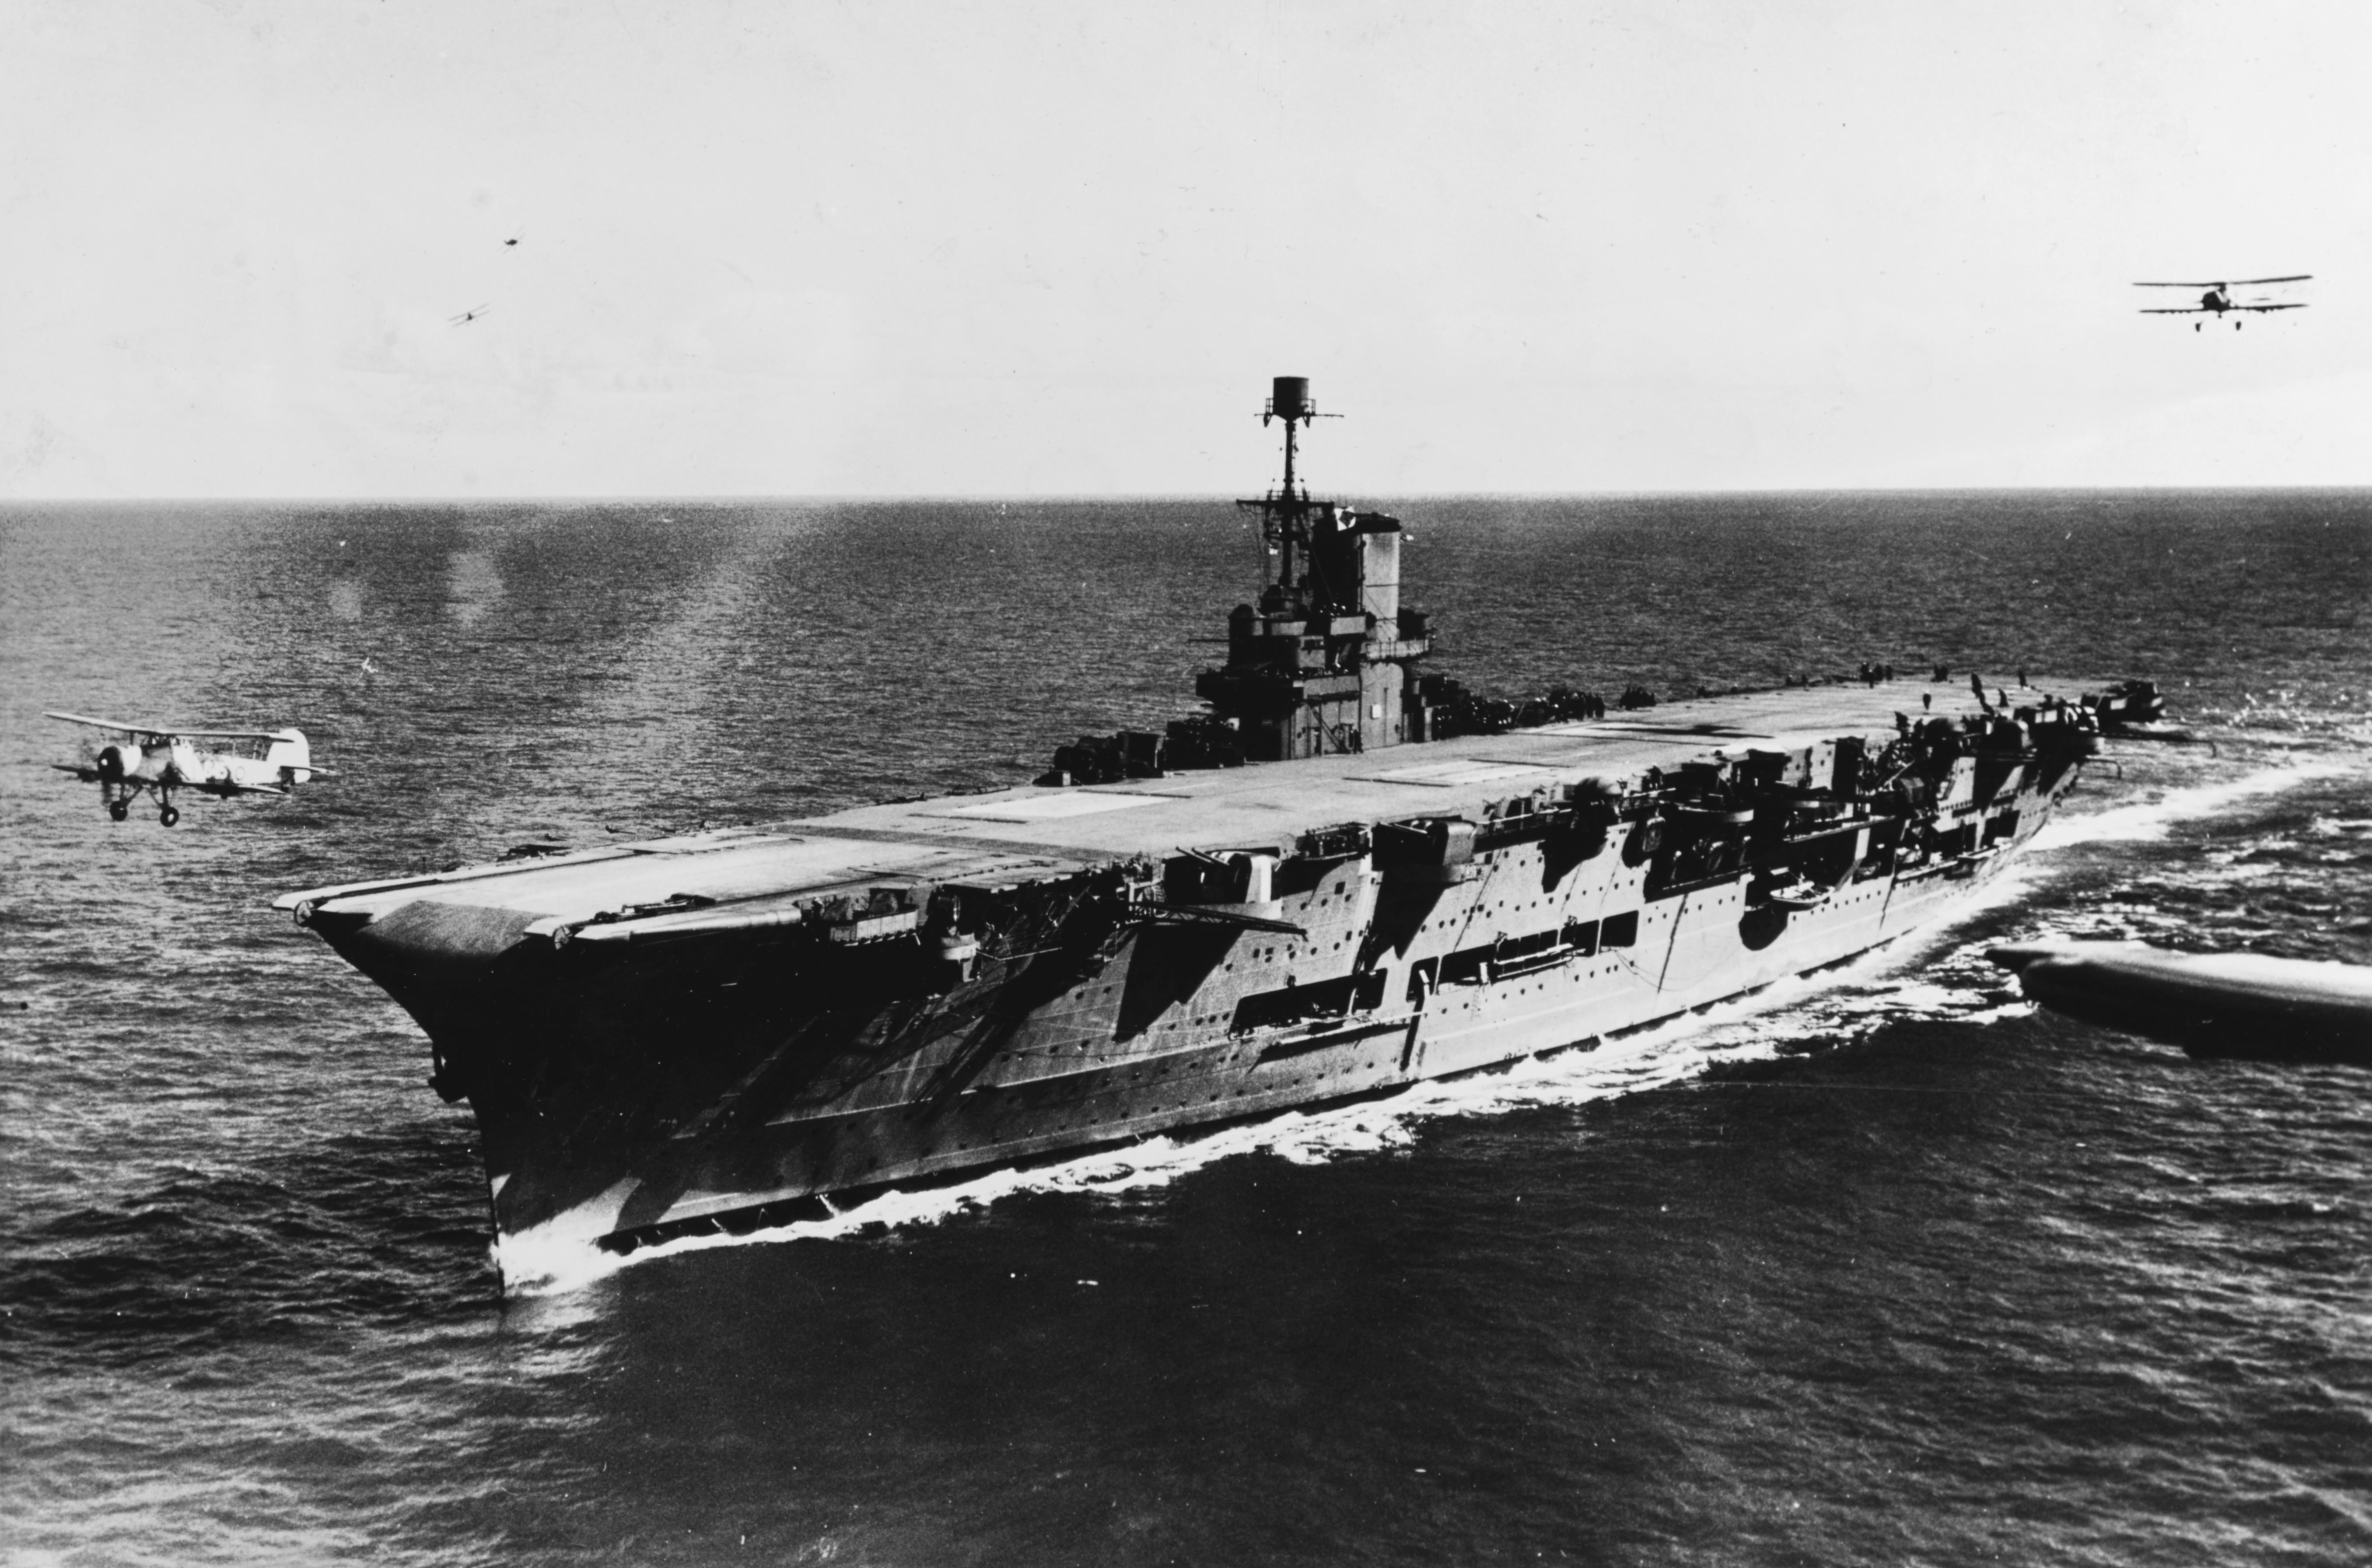 dabc013e614a2 HMS Ark Royal (1937) – Wikipedia, wolna encyklopedia